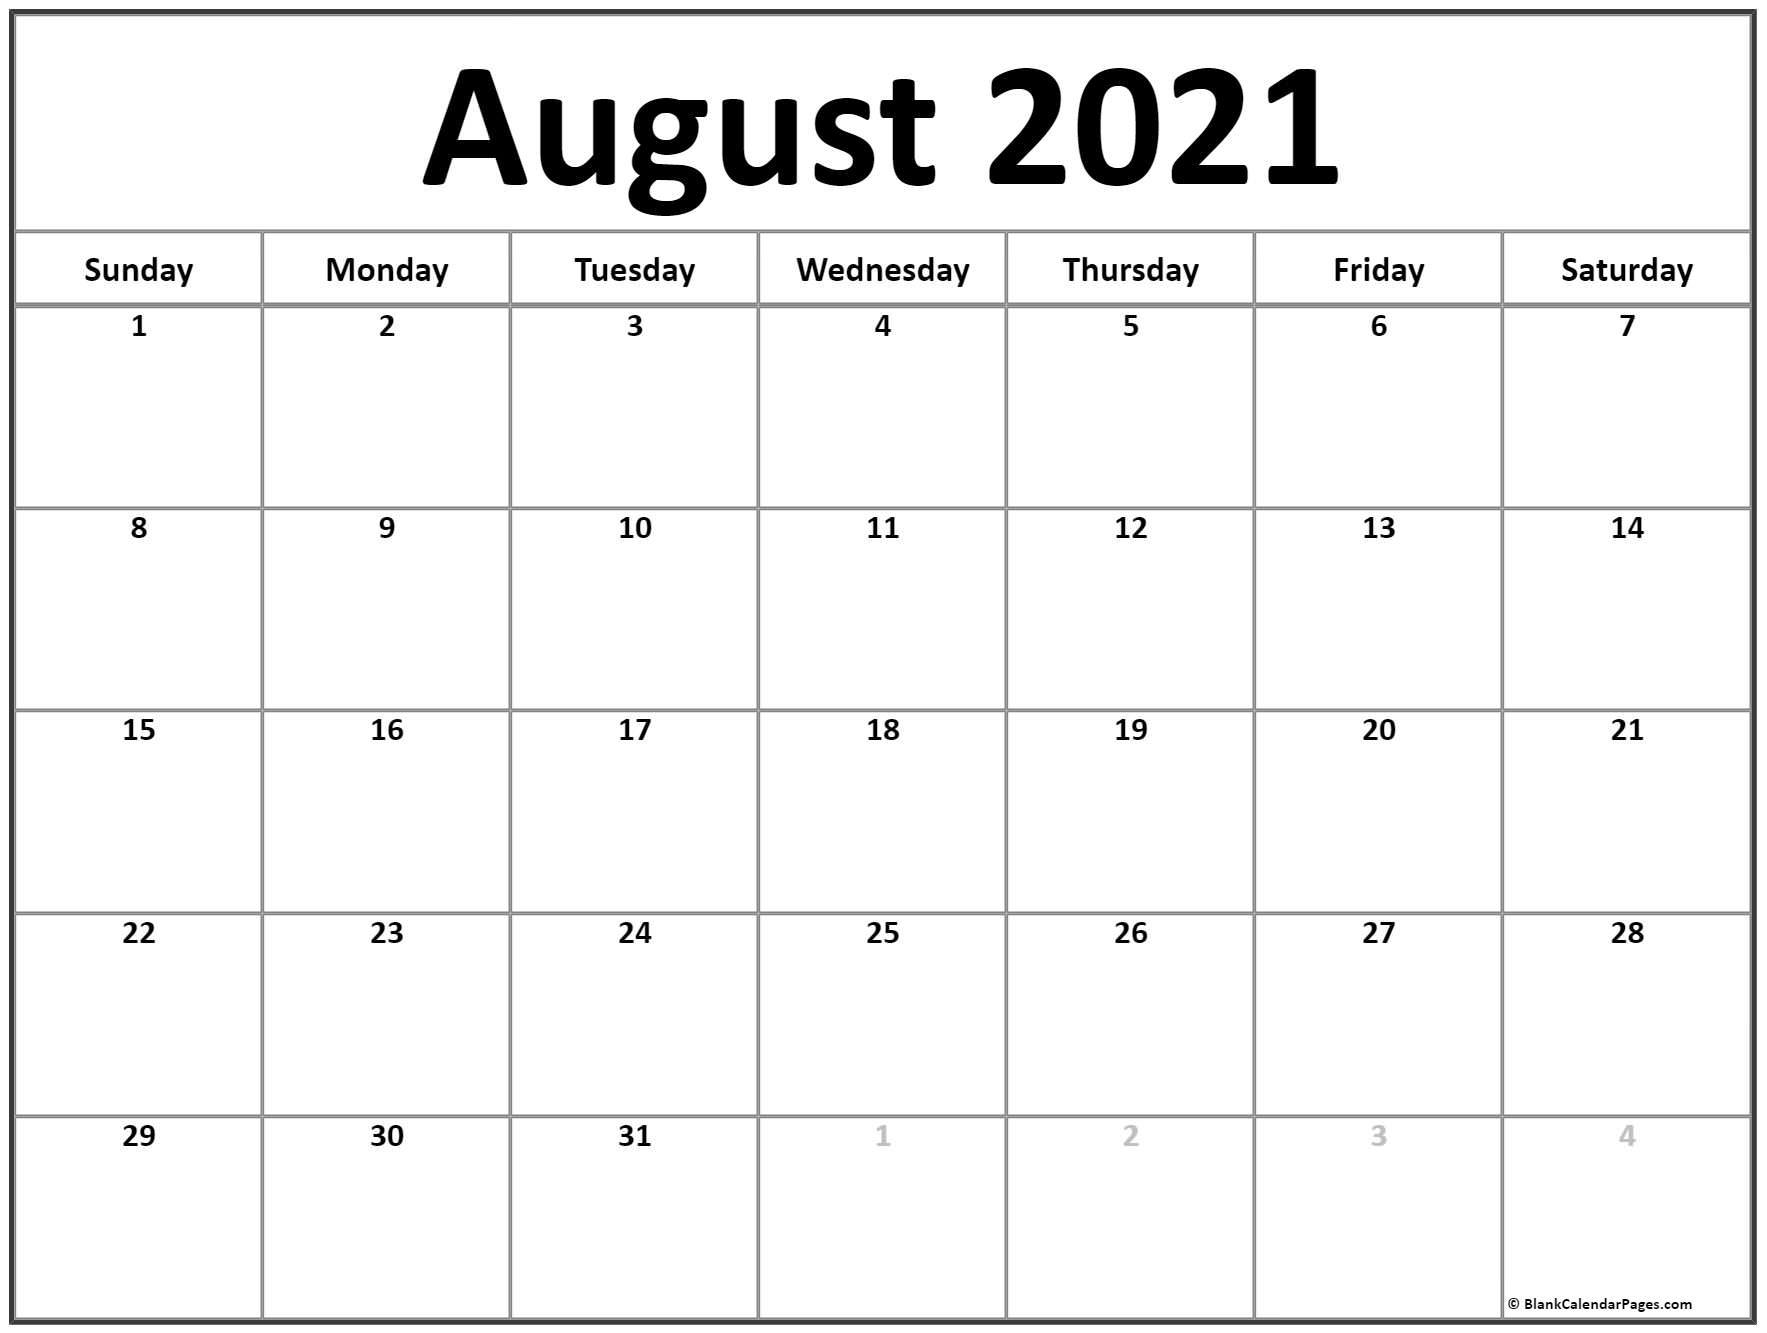 Catch Leo August 2021 Calender